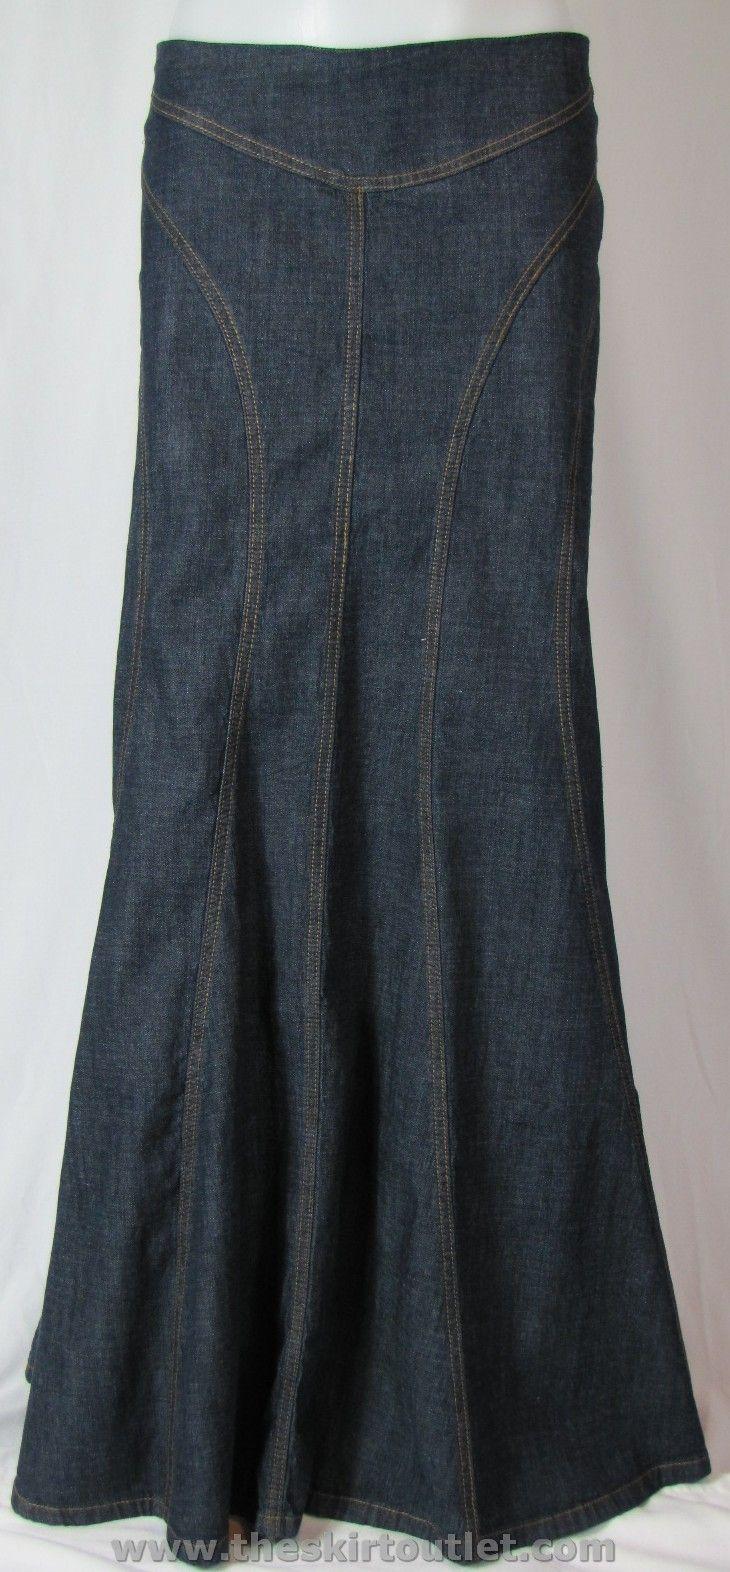 Stitchings Long Jean Skirt...http://www.theskirtoutlet.com/stitchings-long-jean-skirt.html